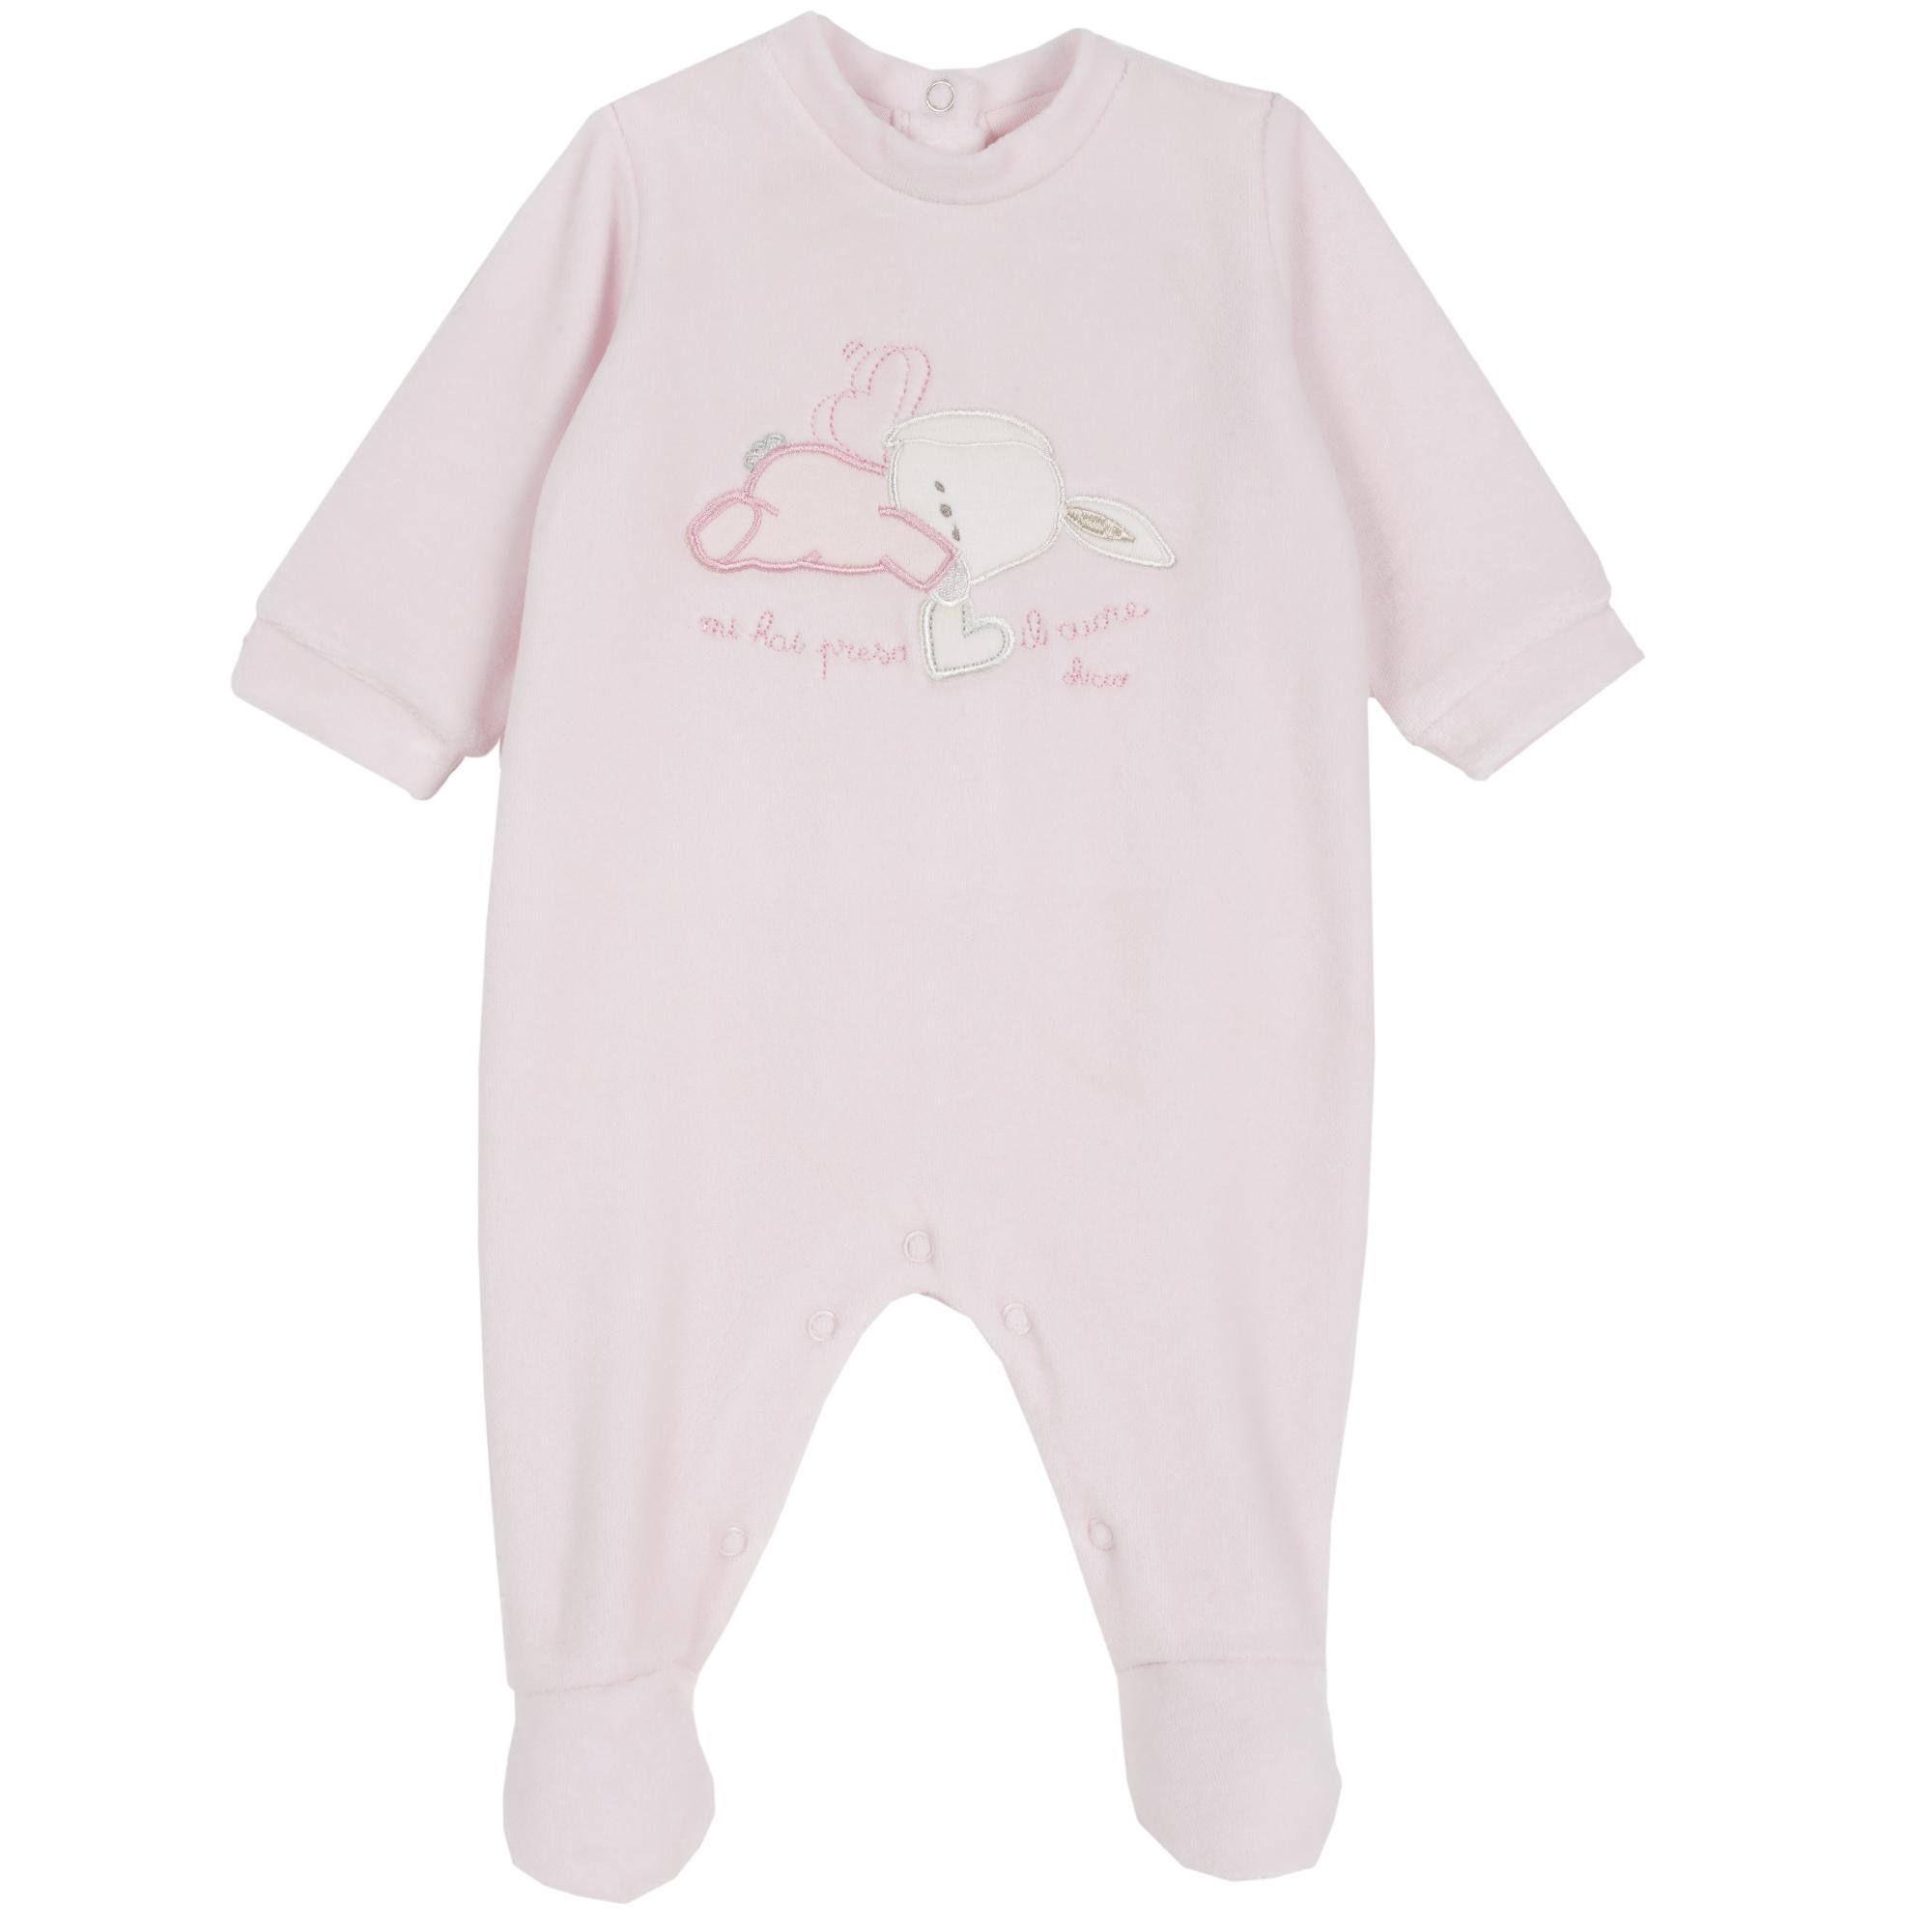 Trusou copii Chicco salopeta + baveta + caciula roz 56 thumbnail